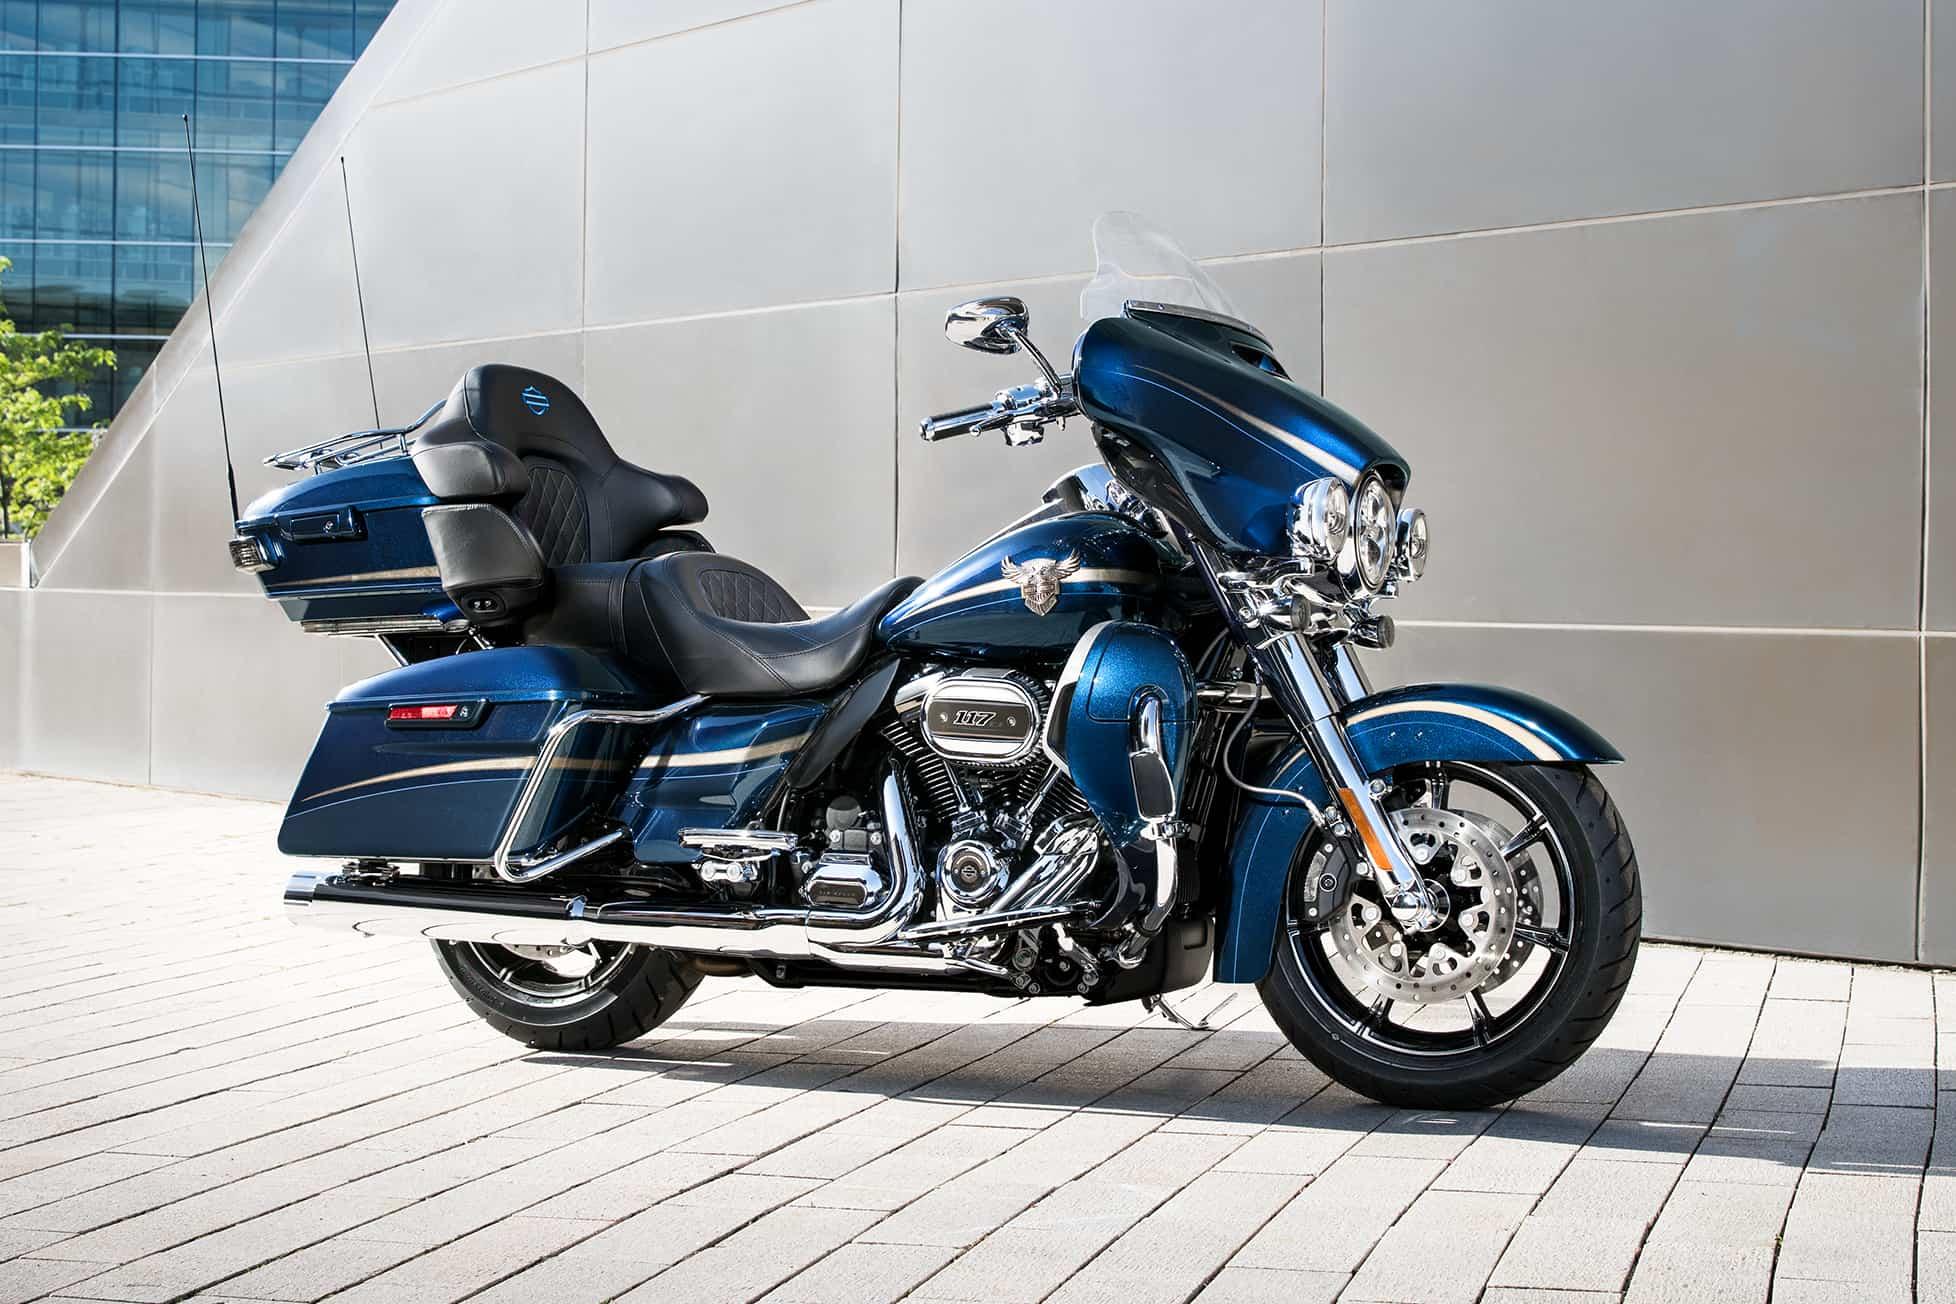 2018 harley davidson cvo limited motorcycle [ 1137 x 758 Pixel ]